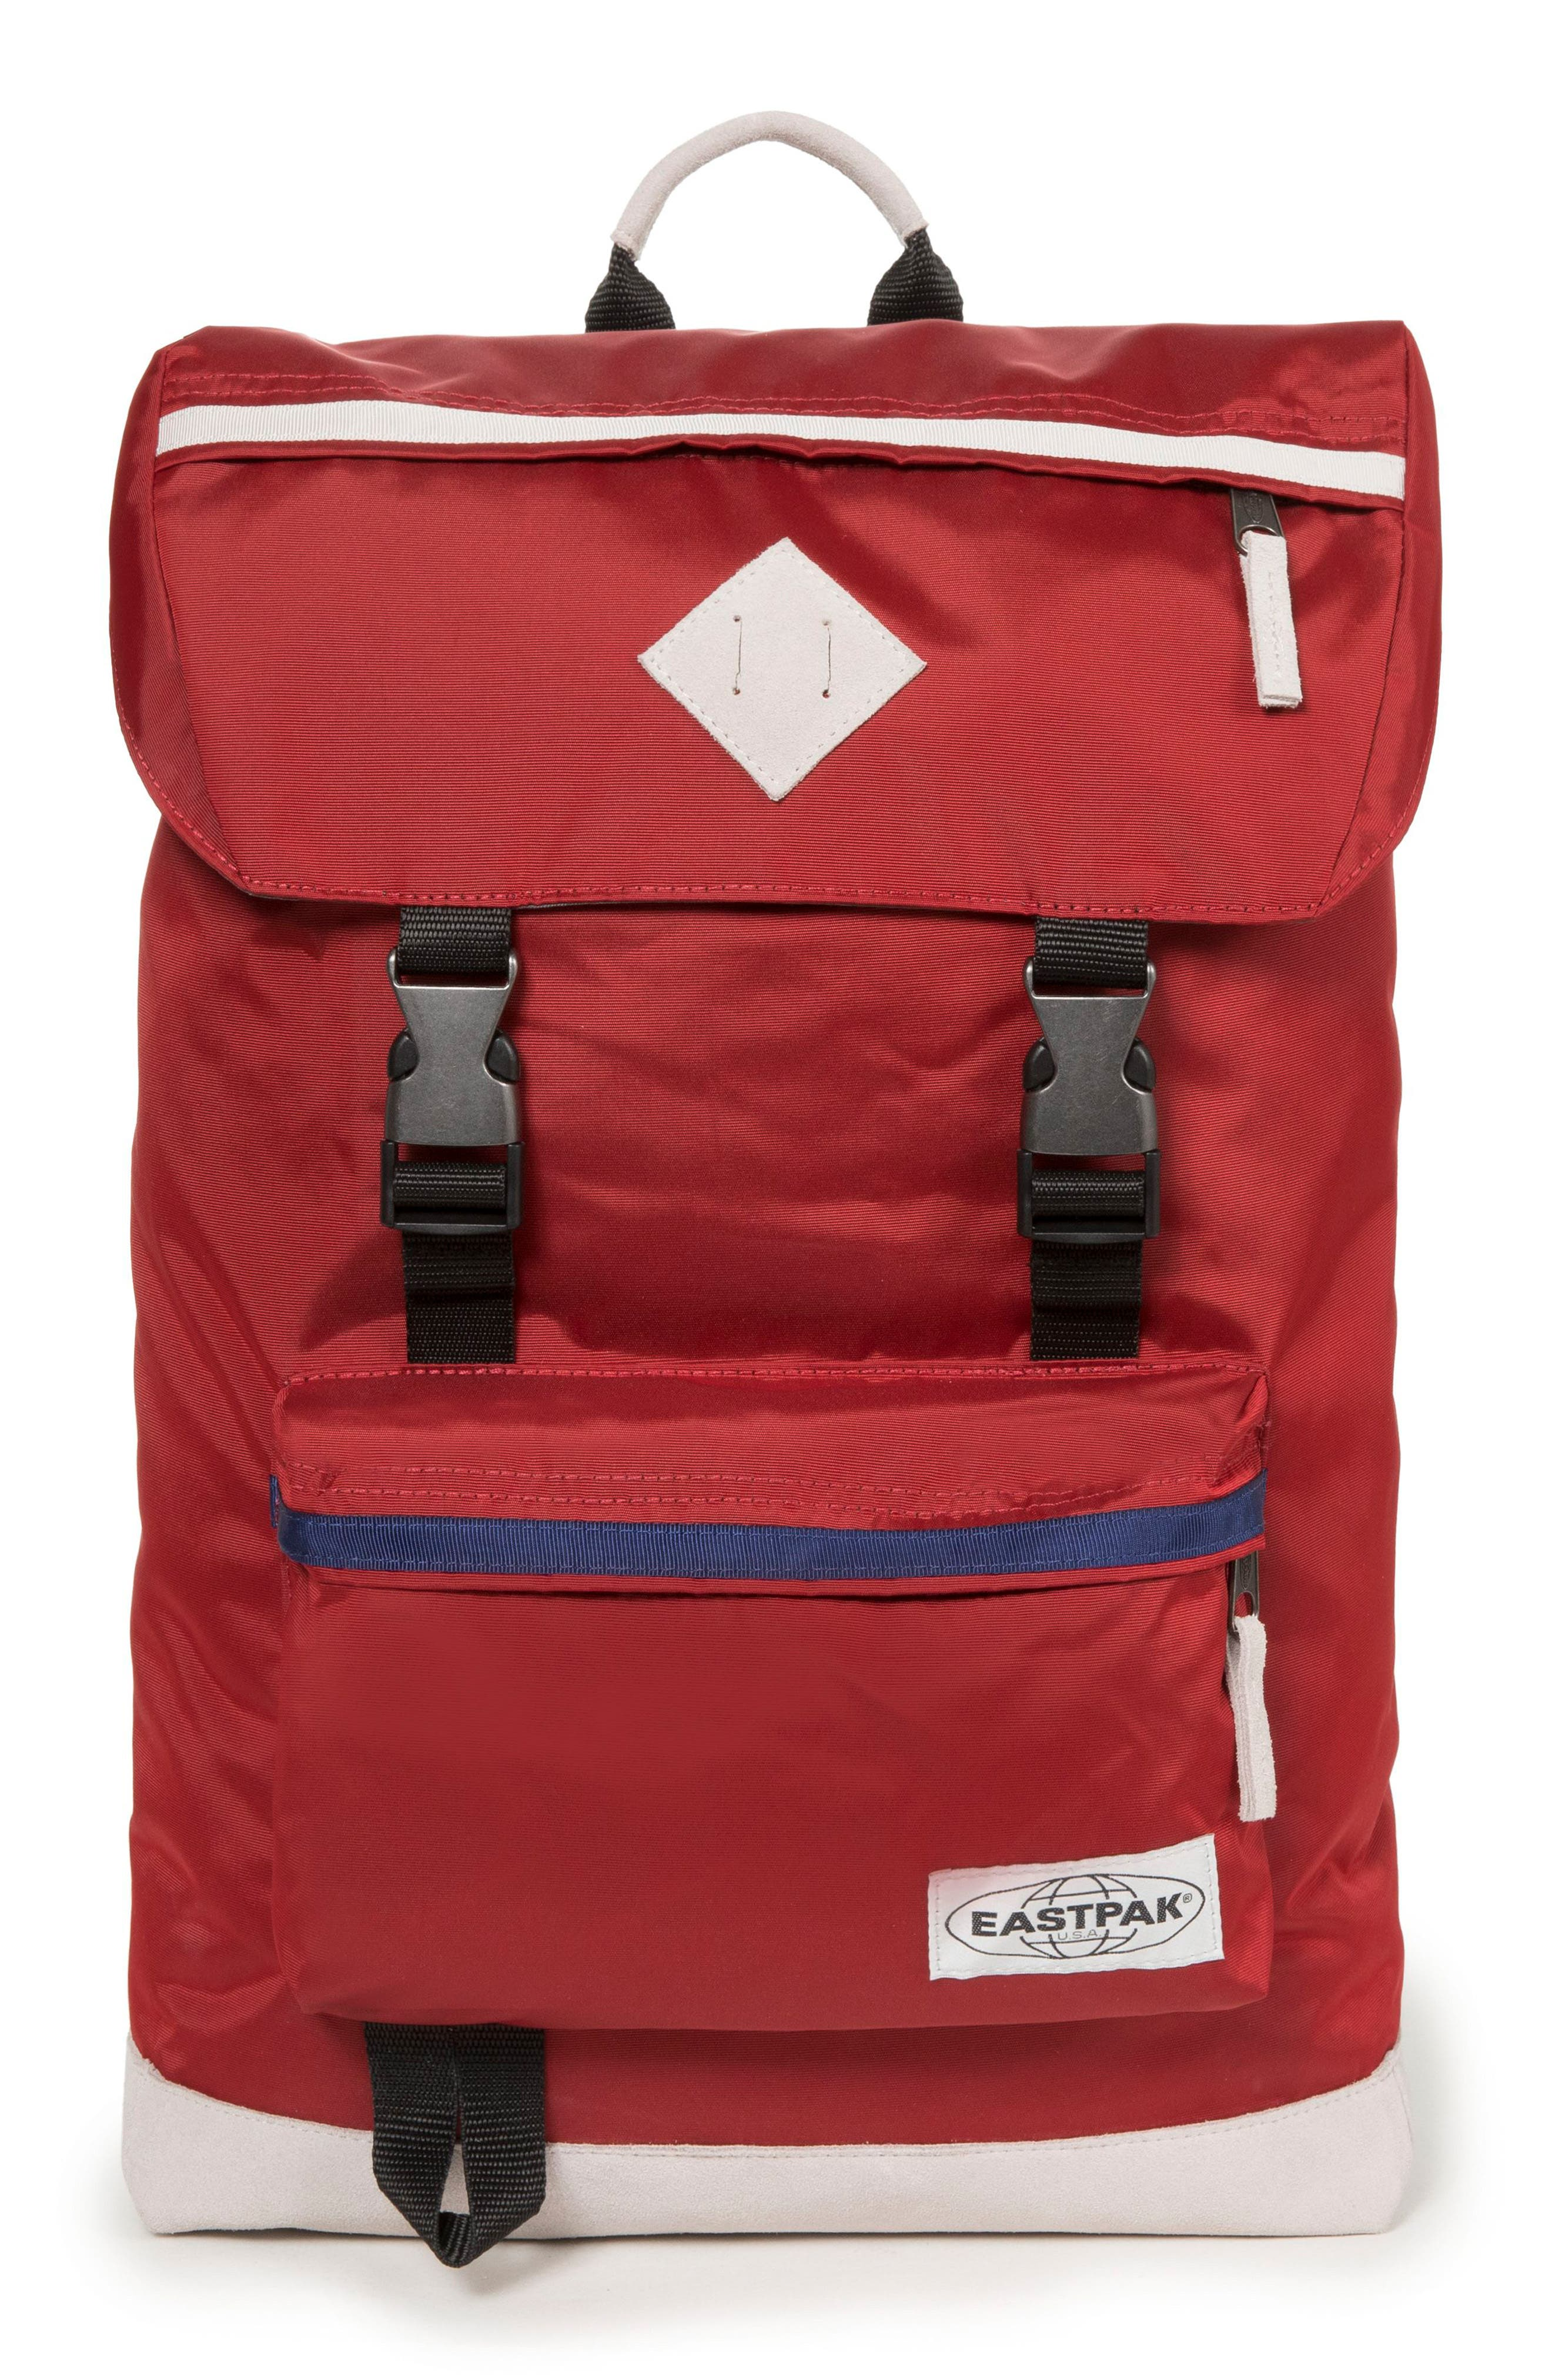 Eastpack Rowlo Backpack - Red